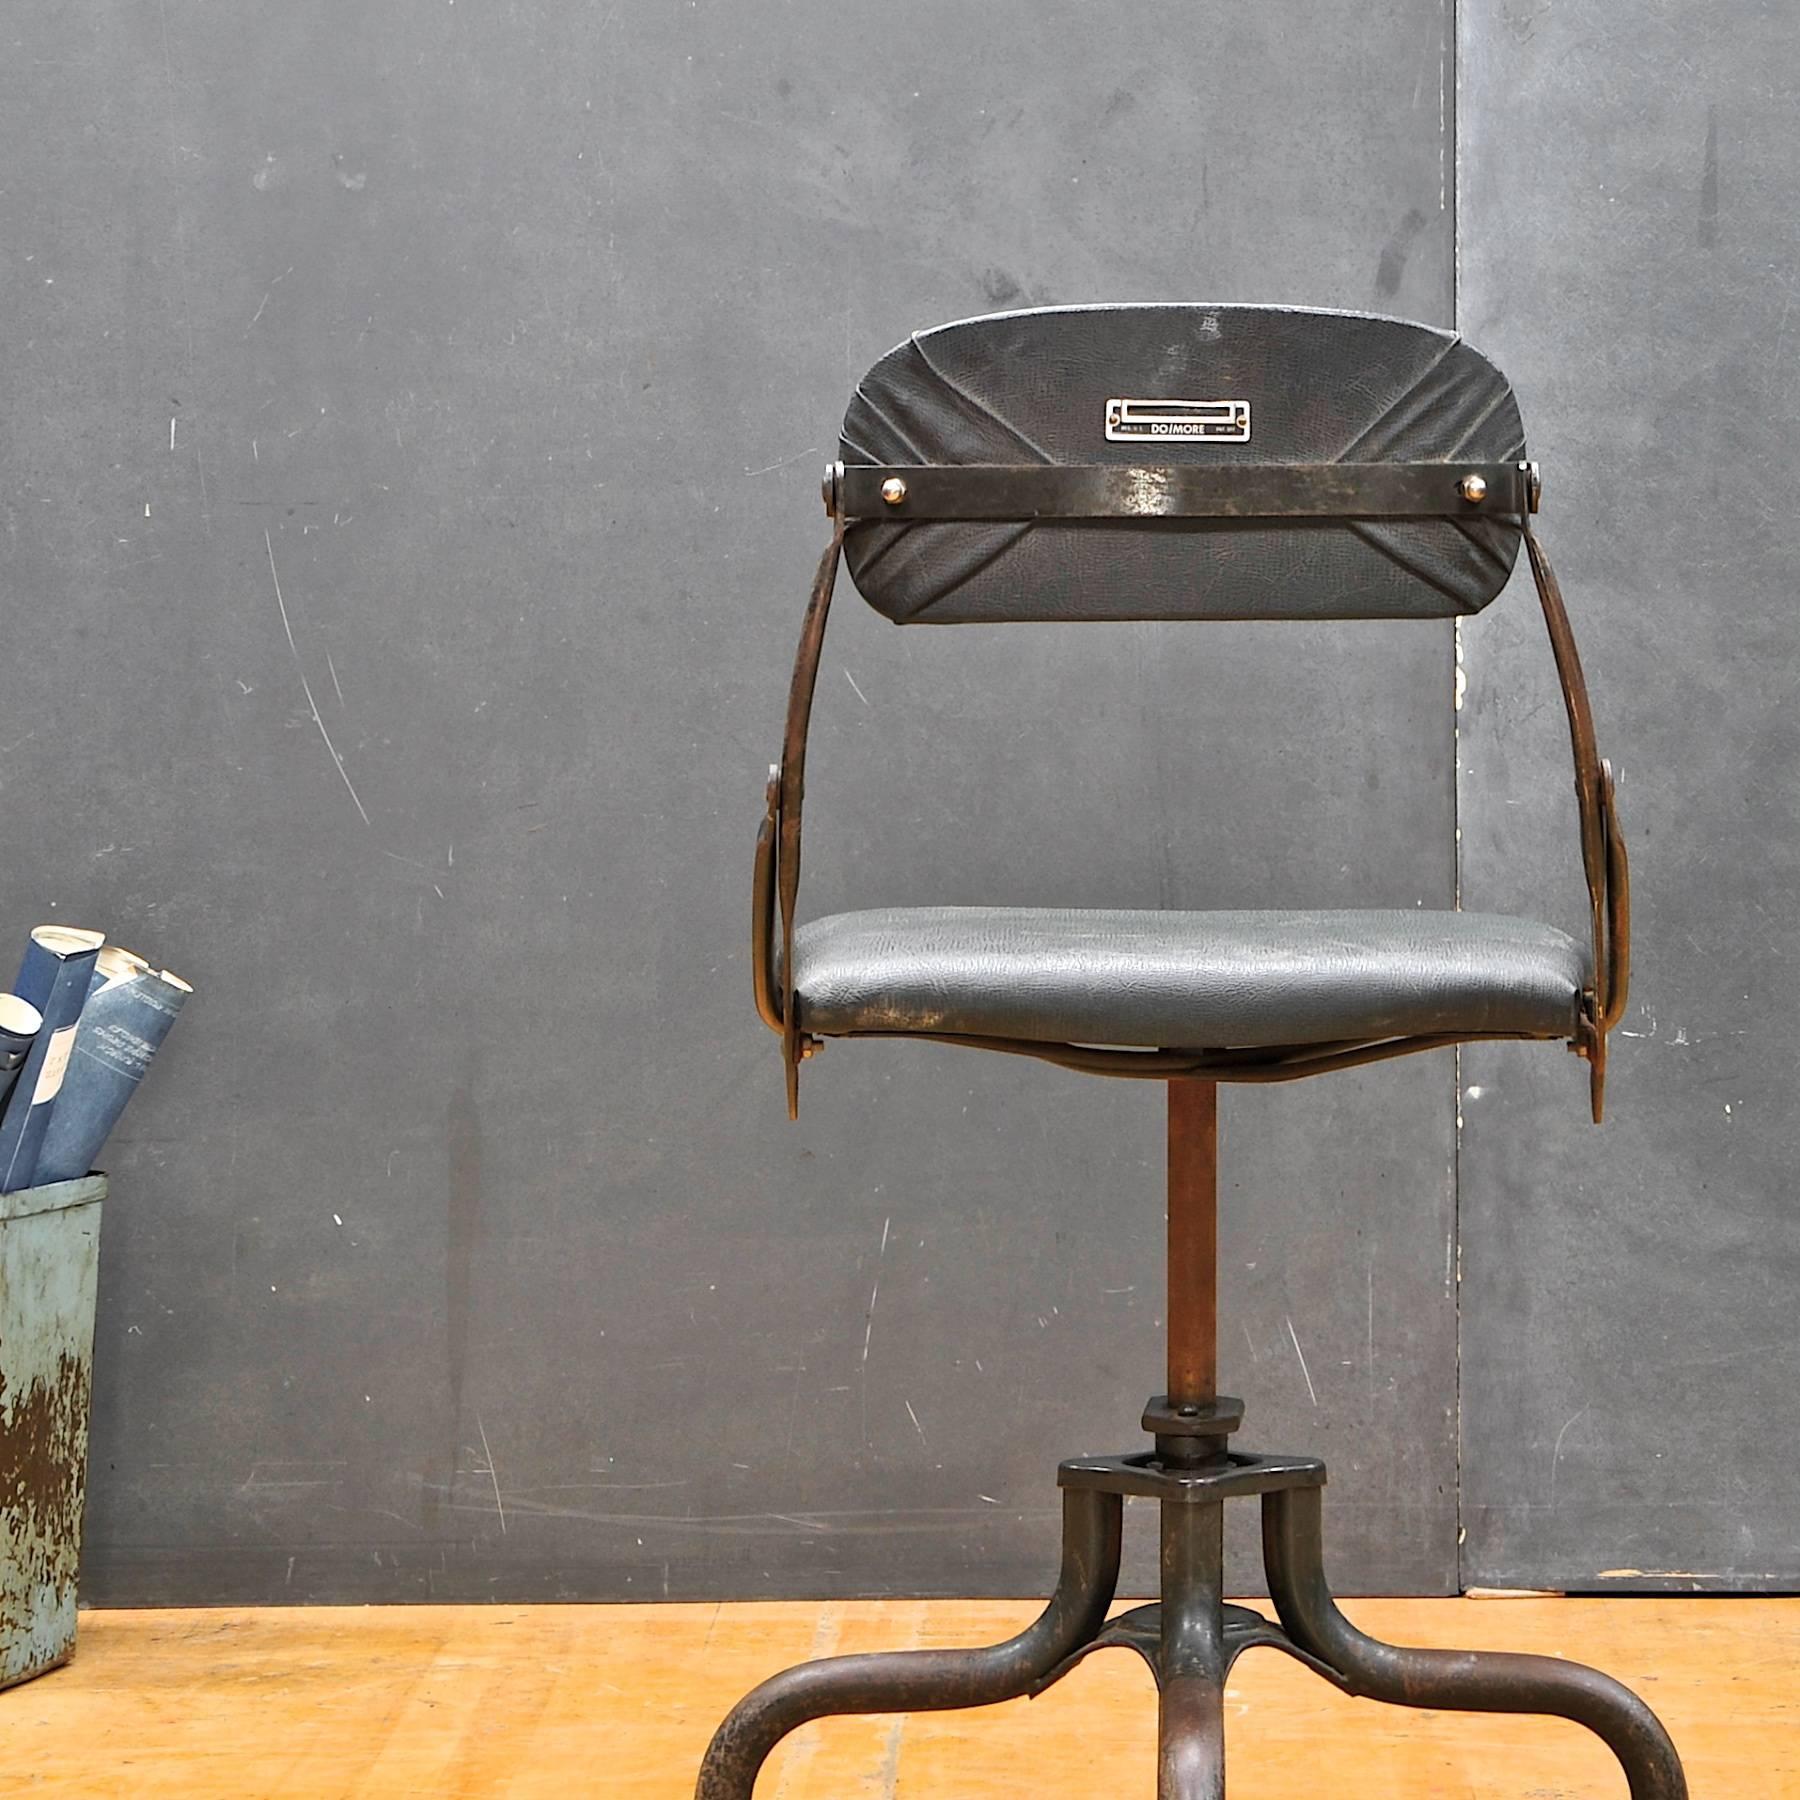 original upholstery vintage industrial clerks swivel desk chair rh 1stdibs com industrial desk chair australia industrial desk chairs